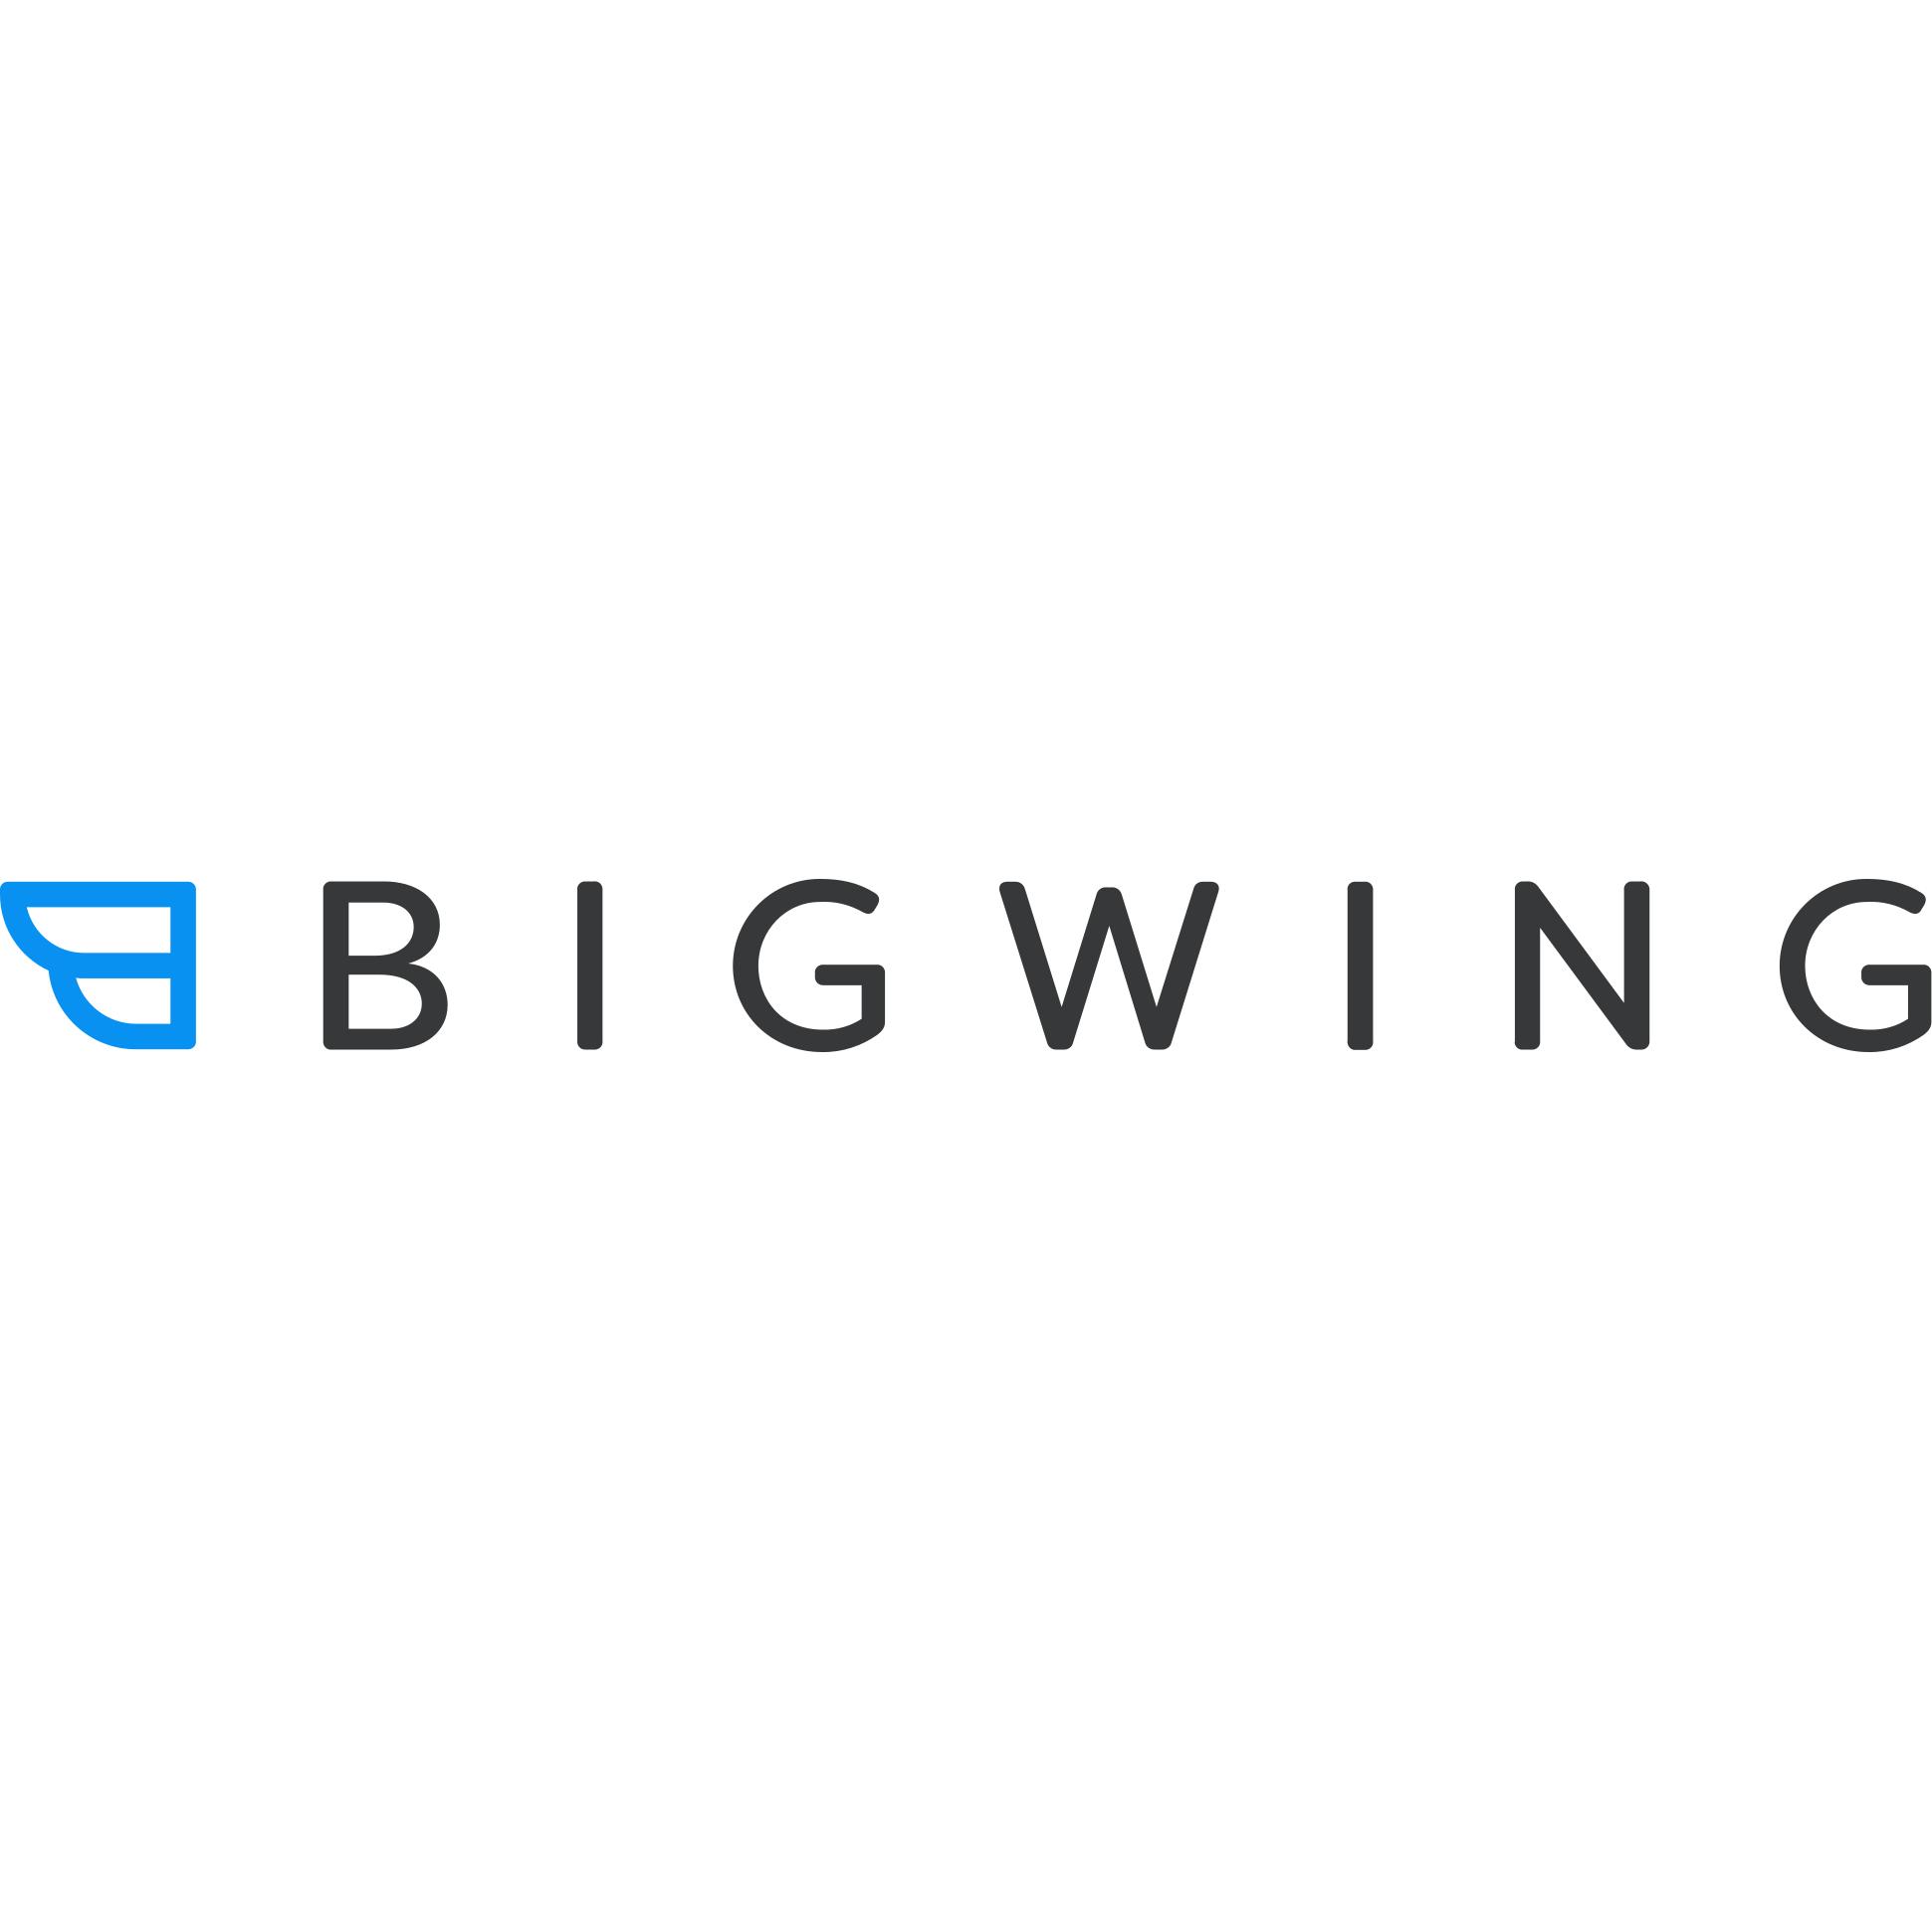 BigWing